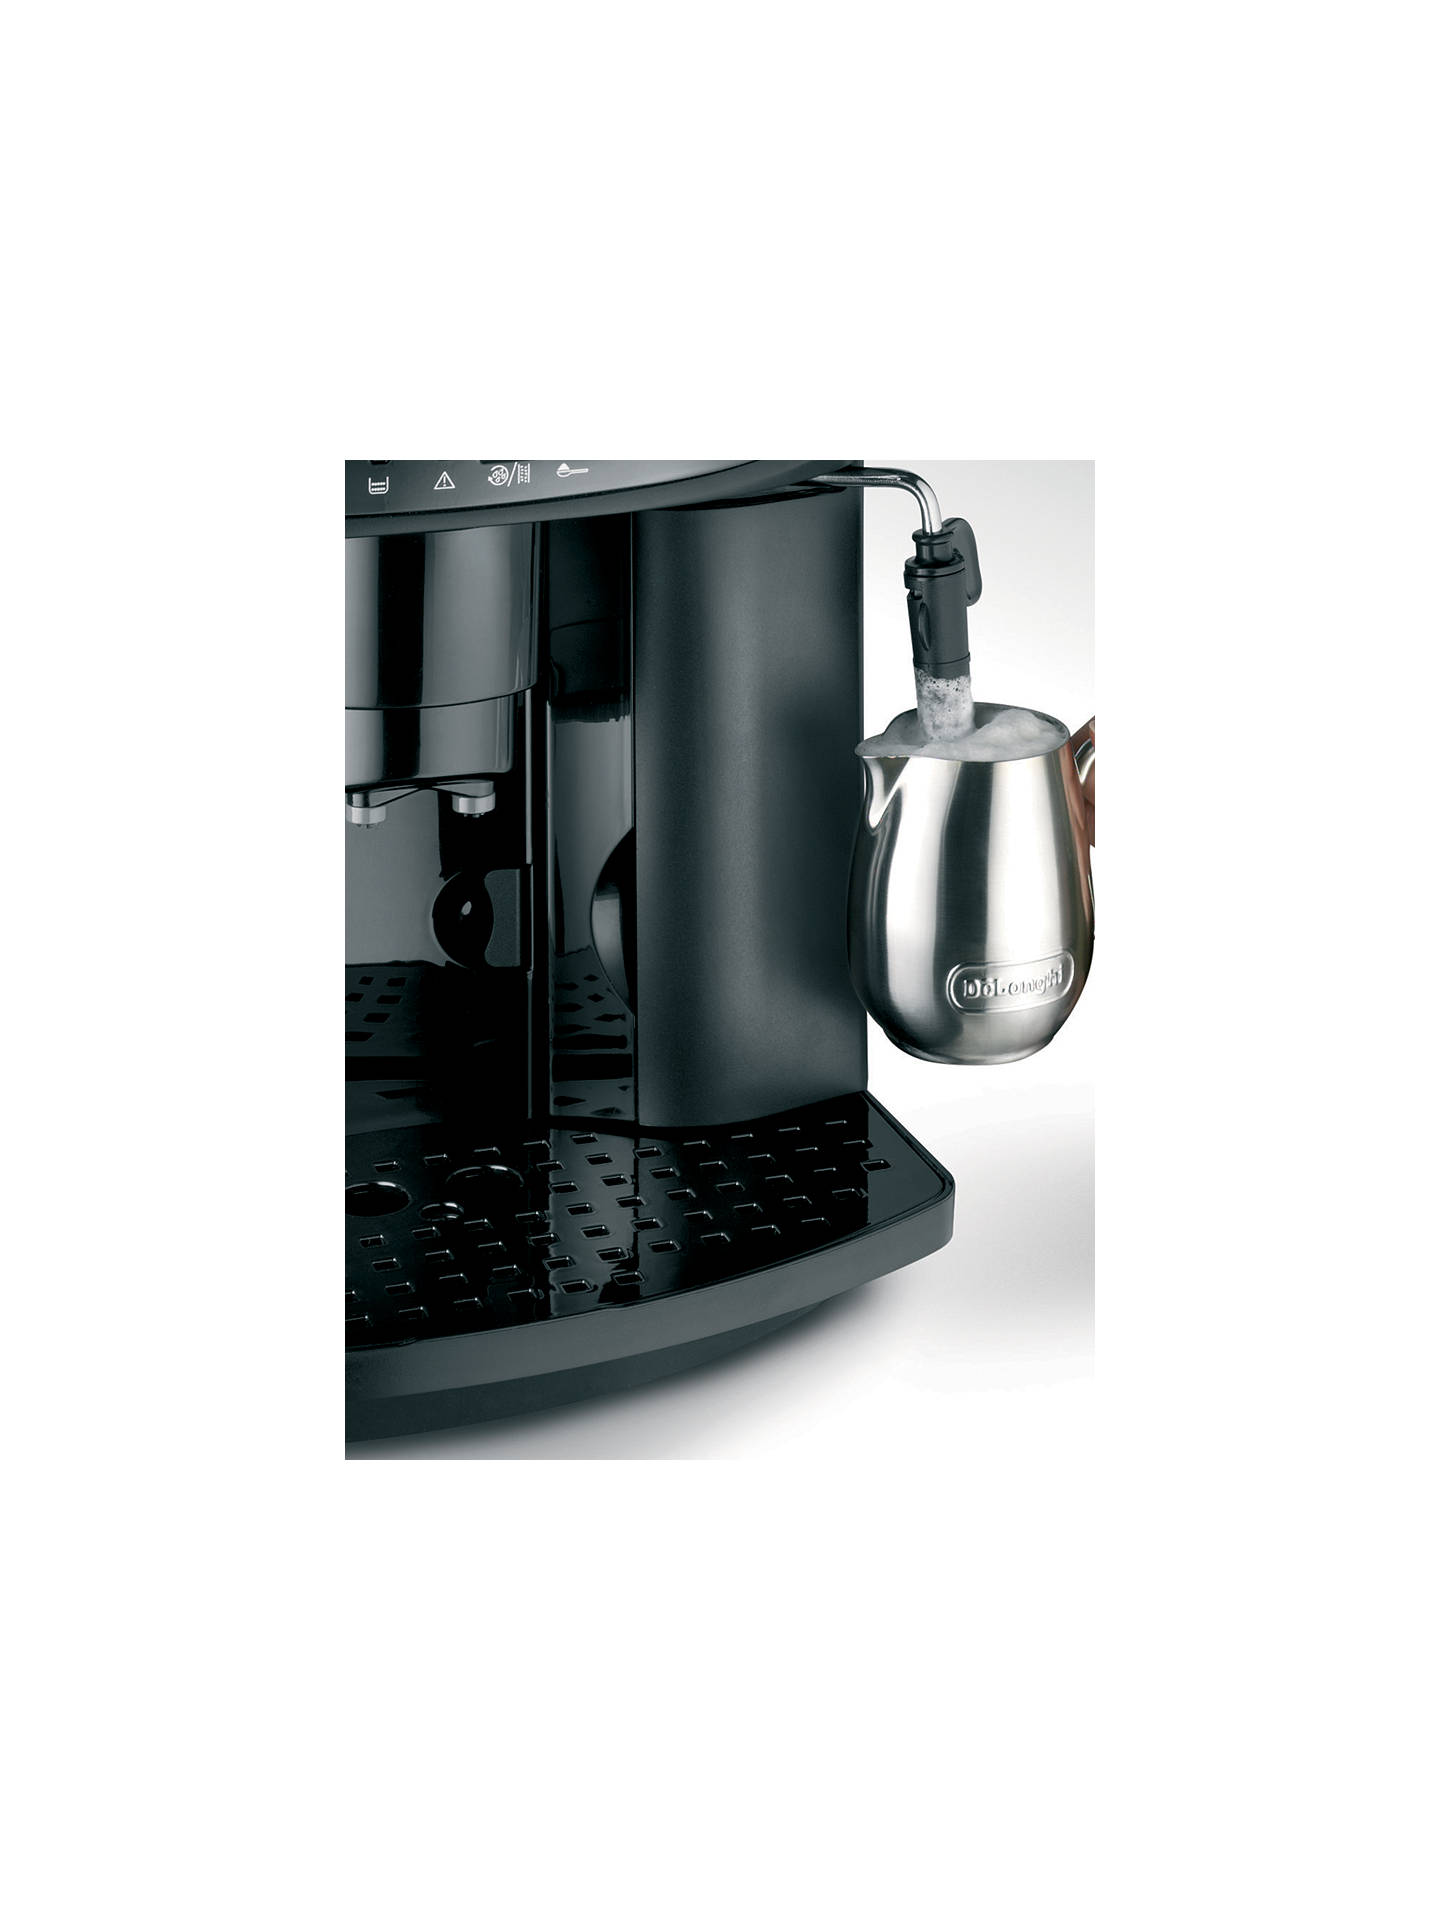 Delonghi Esam3000b Magnifica Bean To Cup Coffee Machine Black